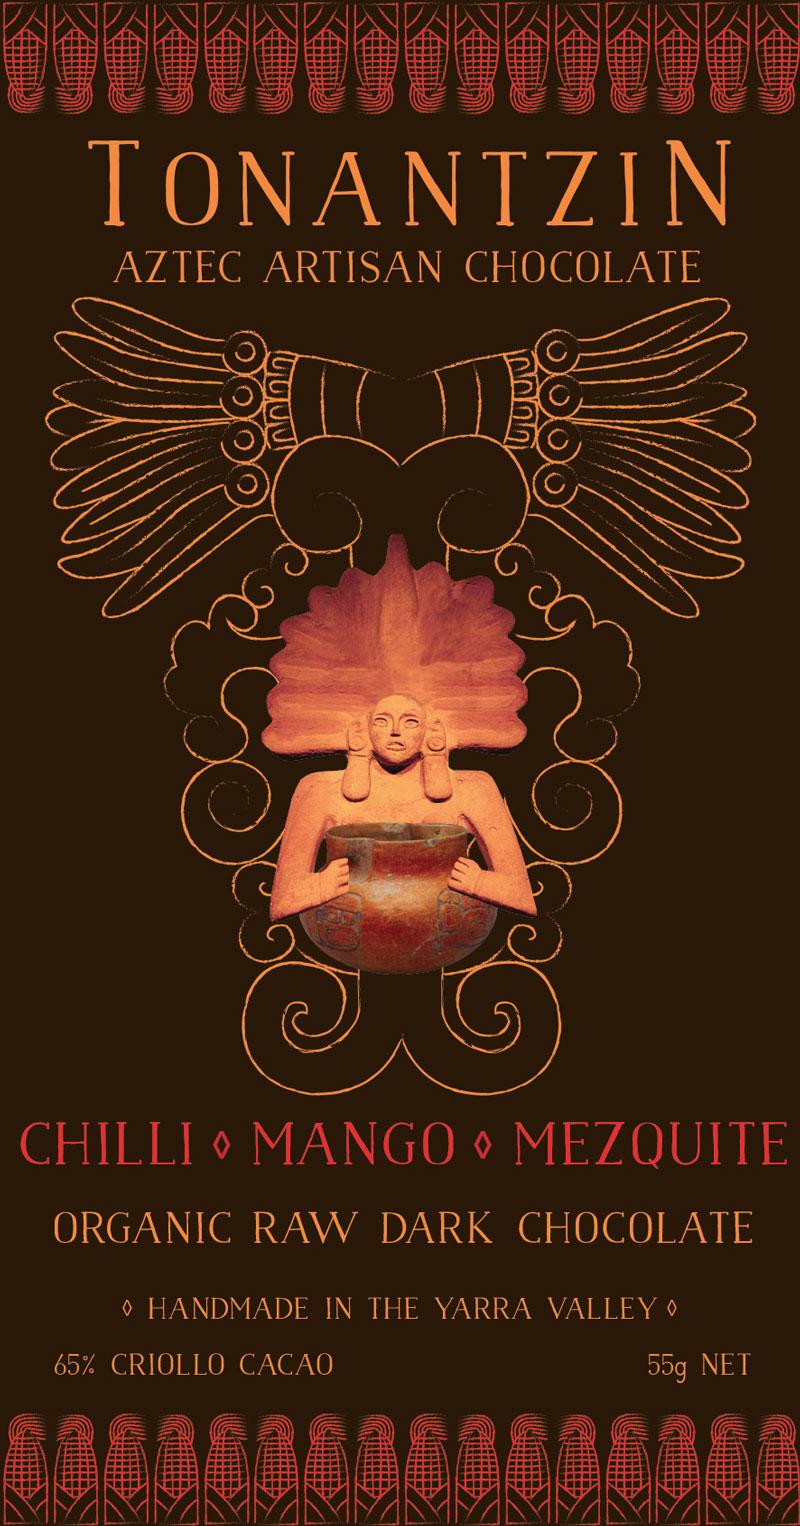 Mezquite Chilli Mango